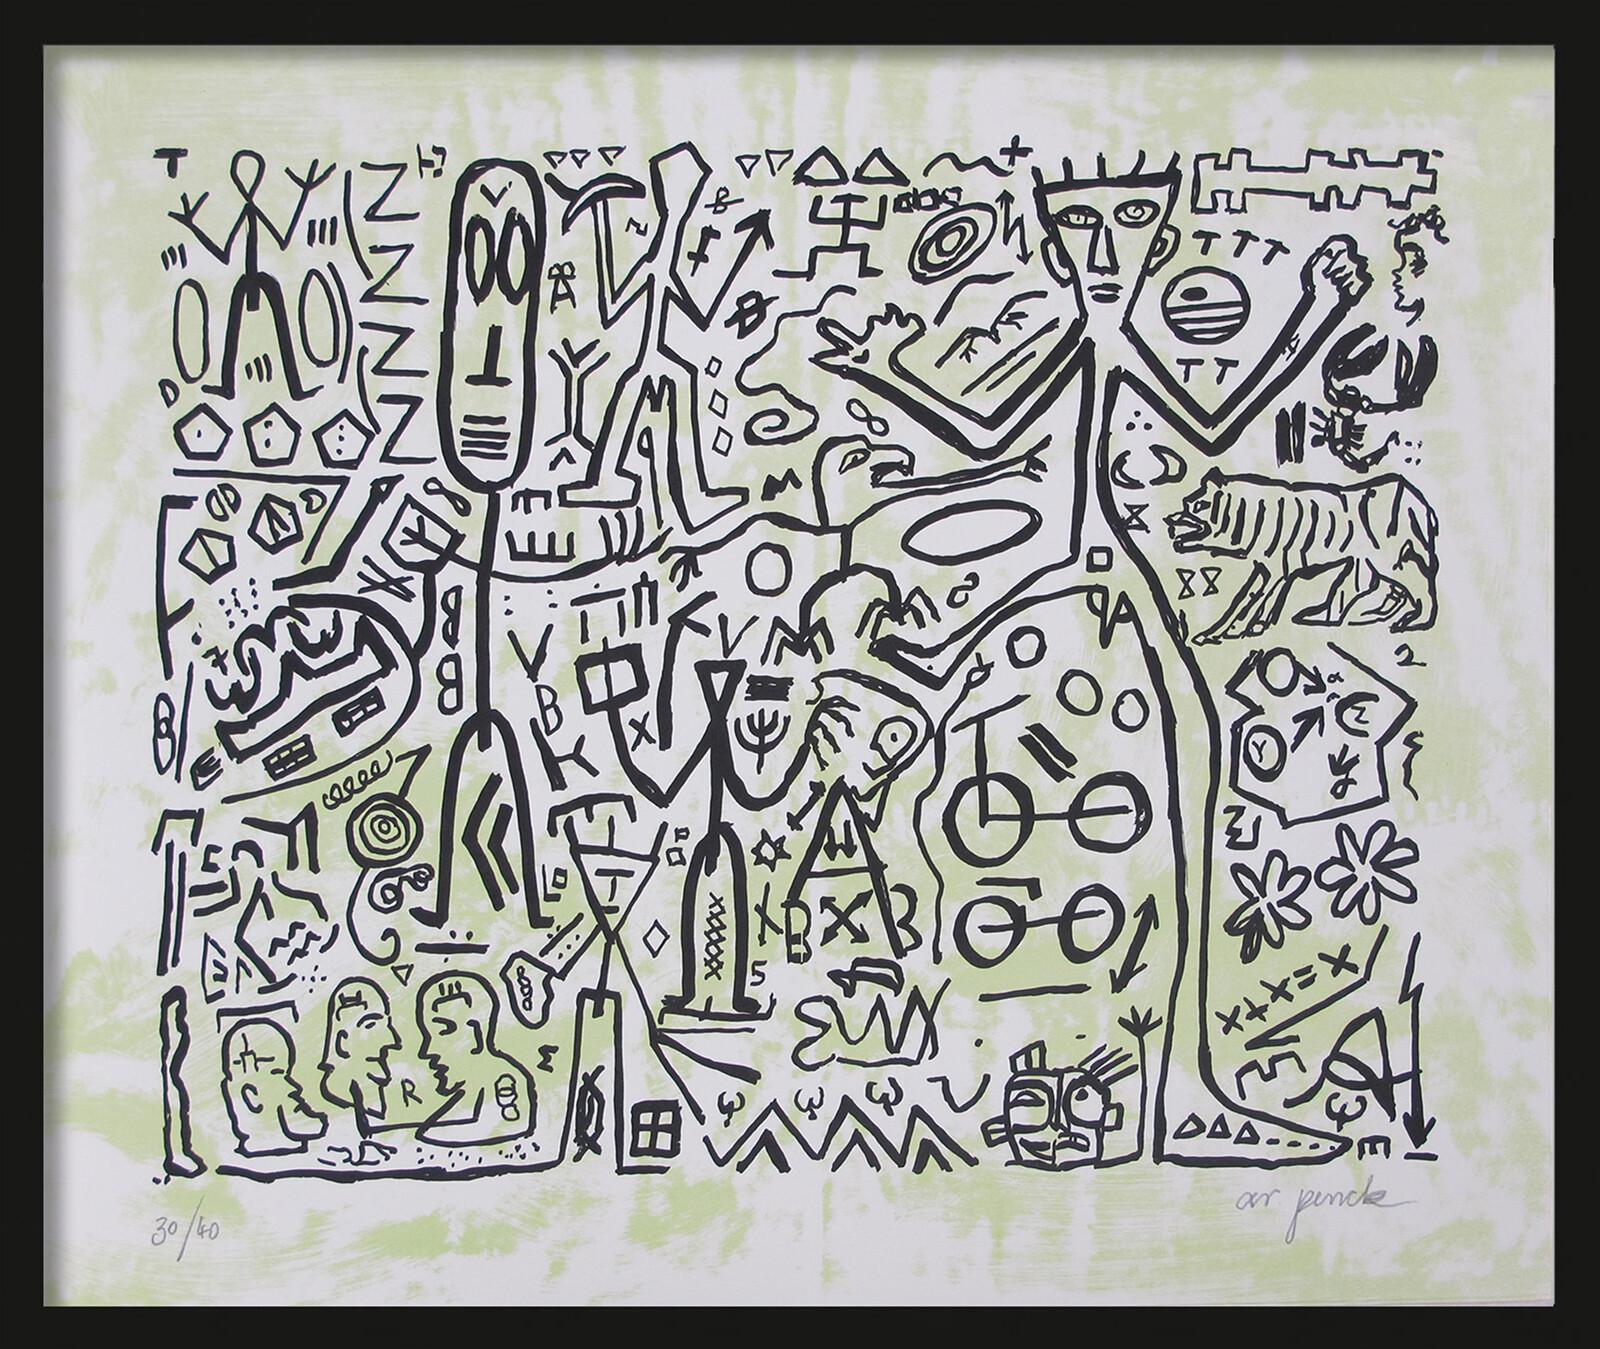 Ohne Titel (Version Grün) - A.r. Penck